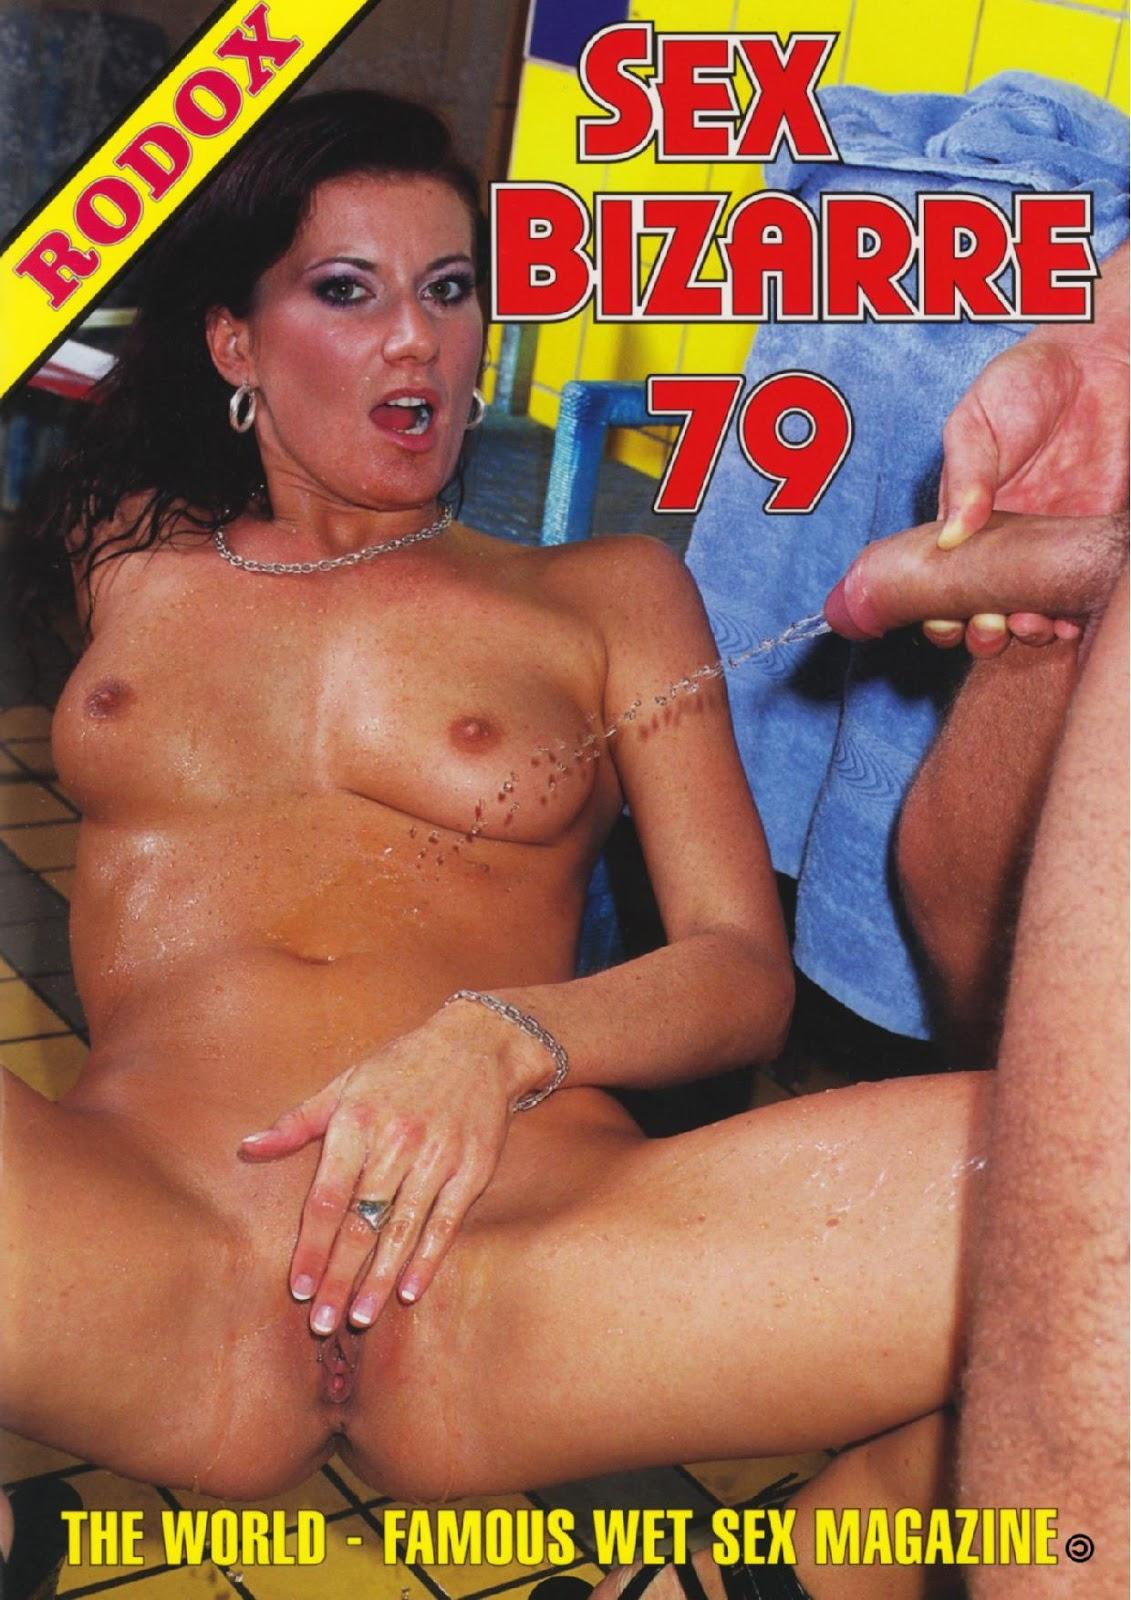 Sex Bizar